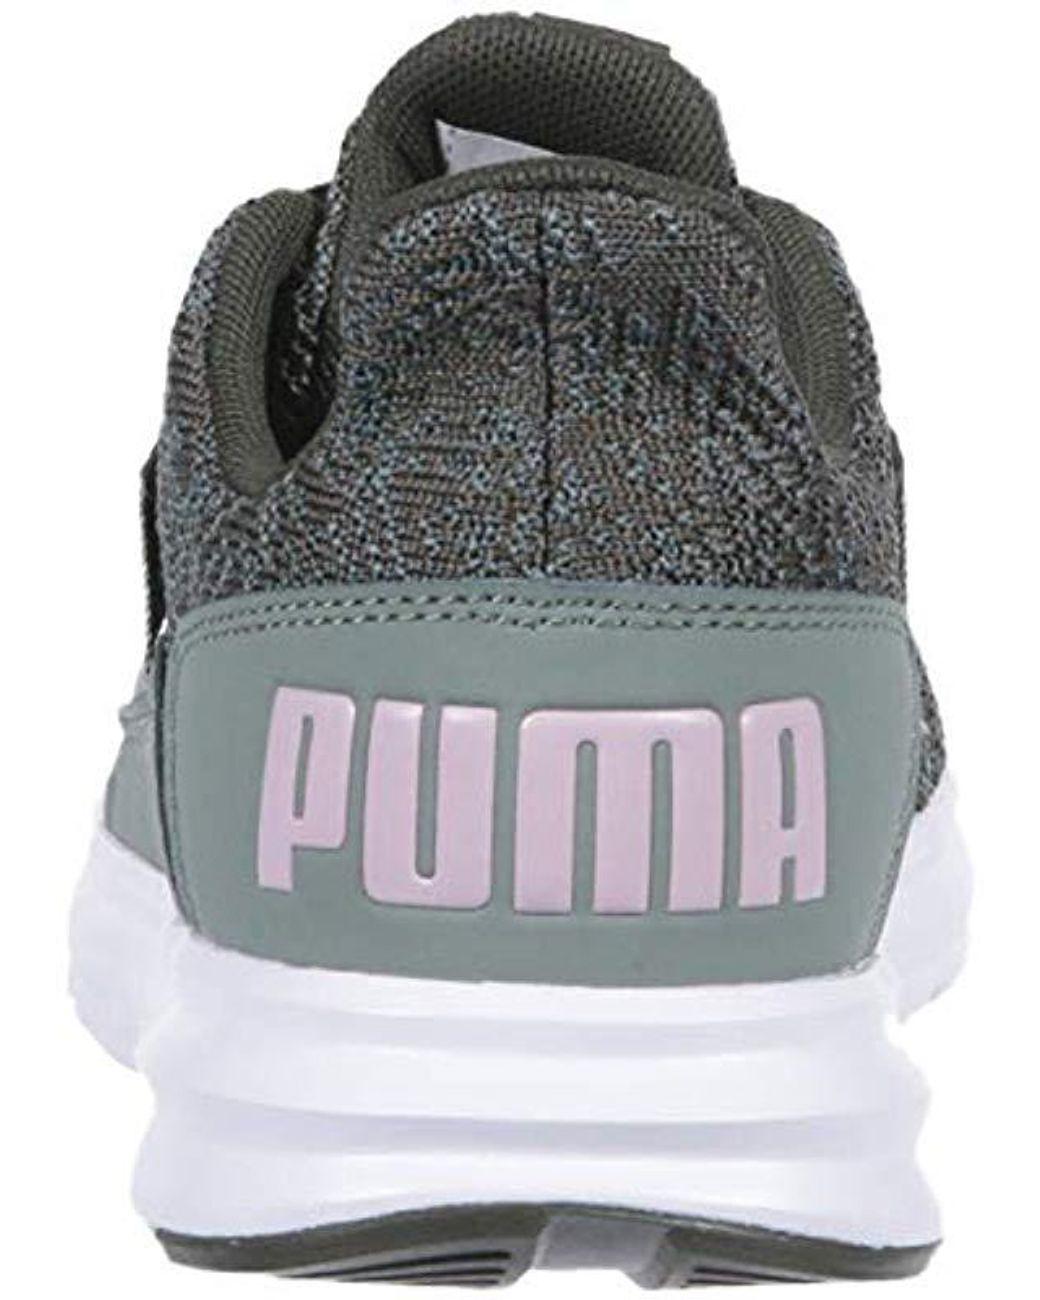 Save 25Lyst Interest Puma Knit Street Sneaker Enzo NX8nZkP0wO